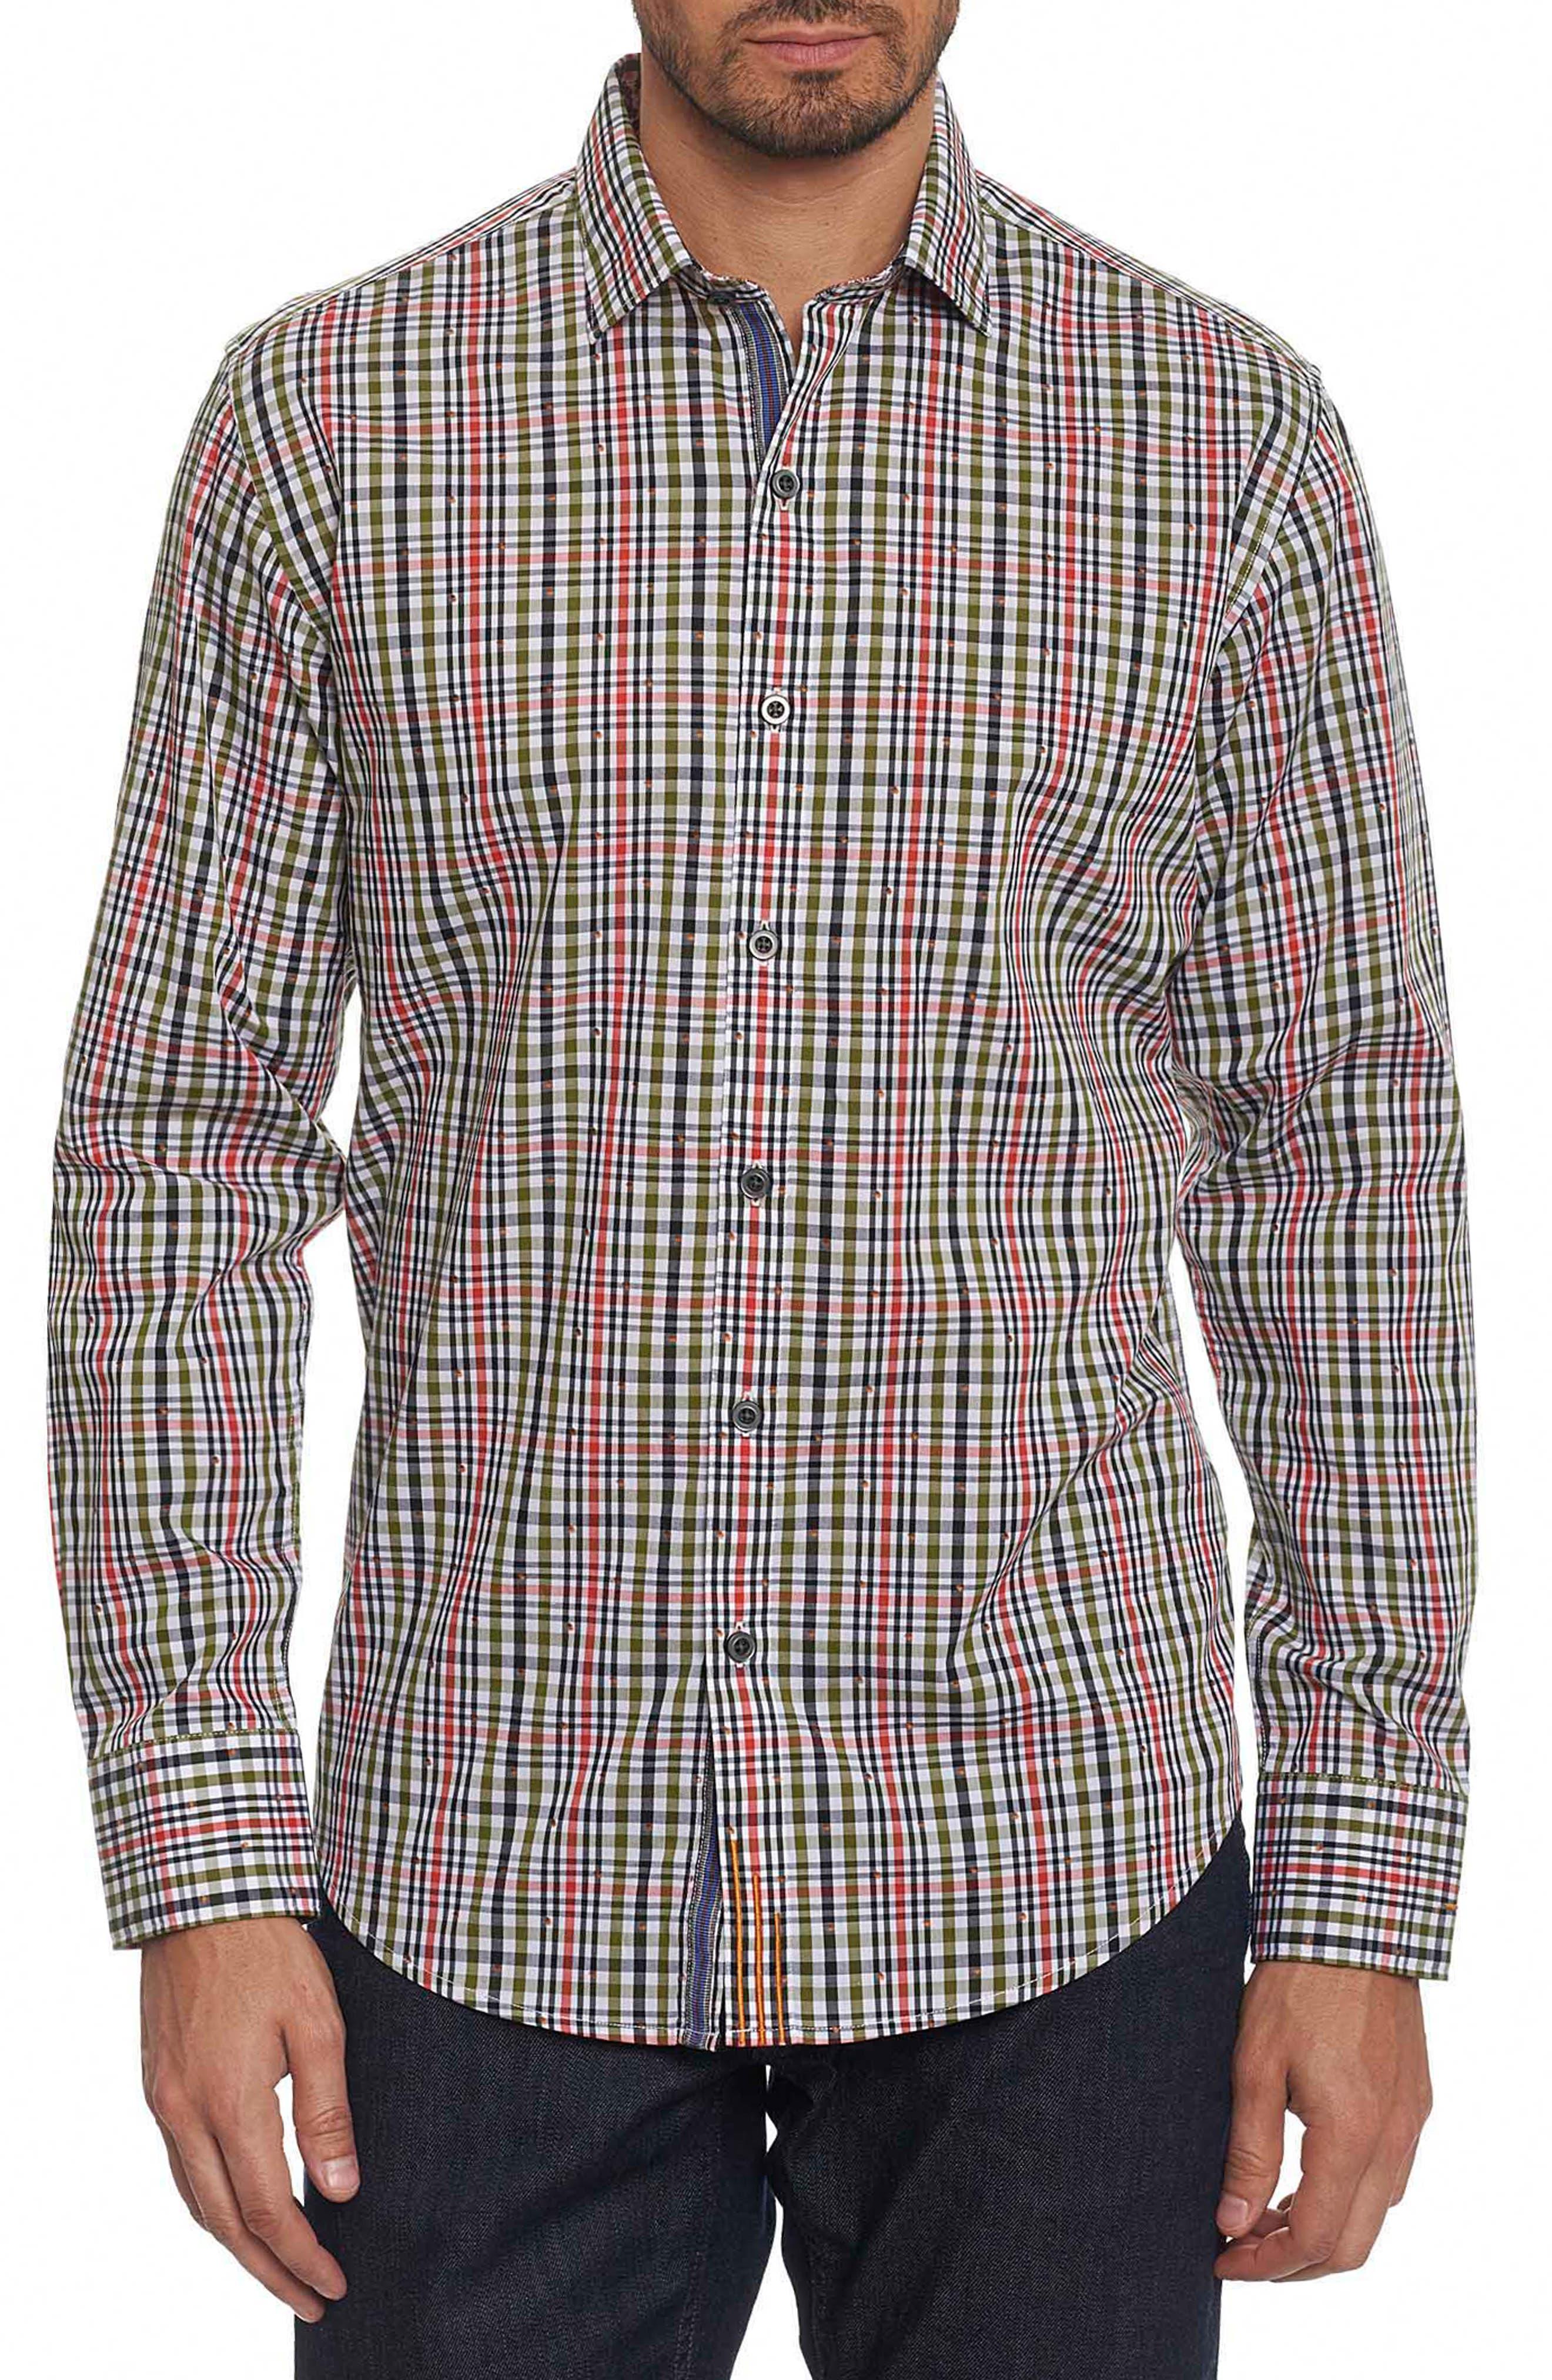 Cape Vincent Classic Fit Dobby Check Sport Shirt,                             Main thumbnail 1, color,                             308